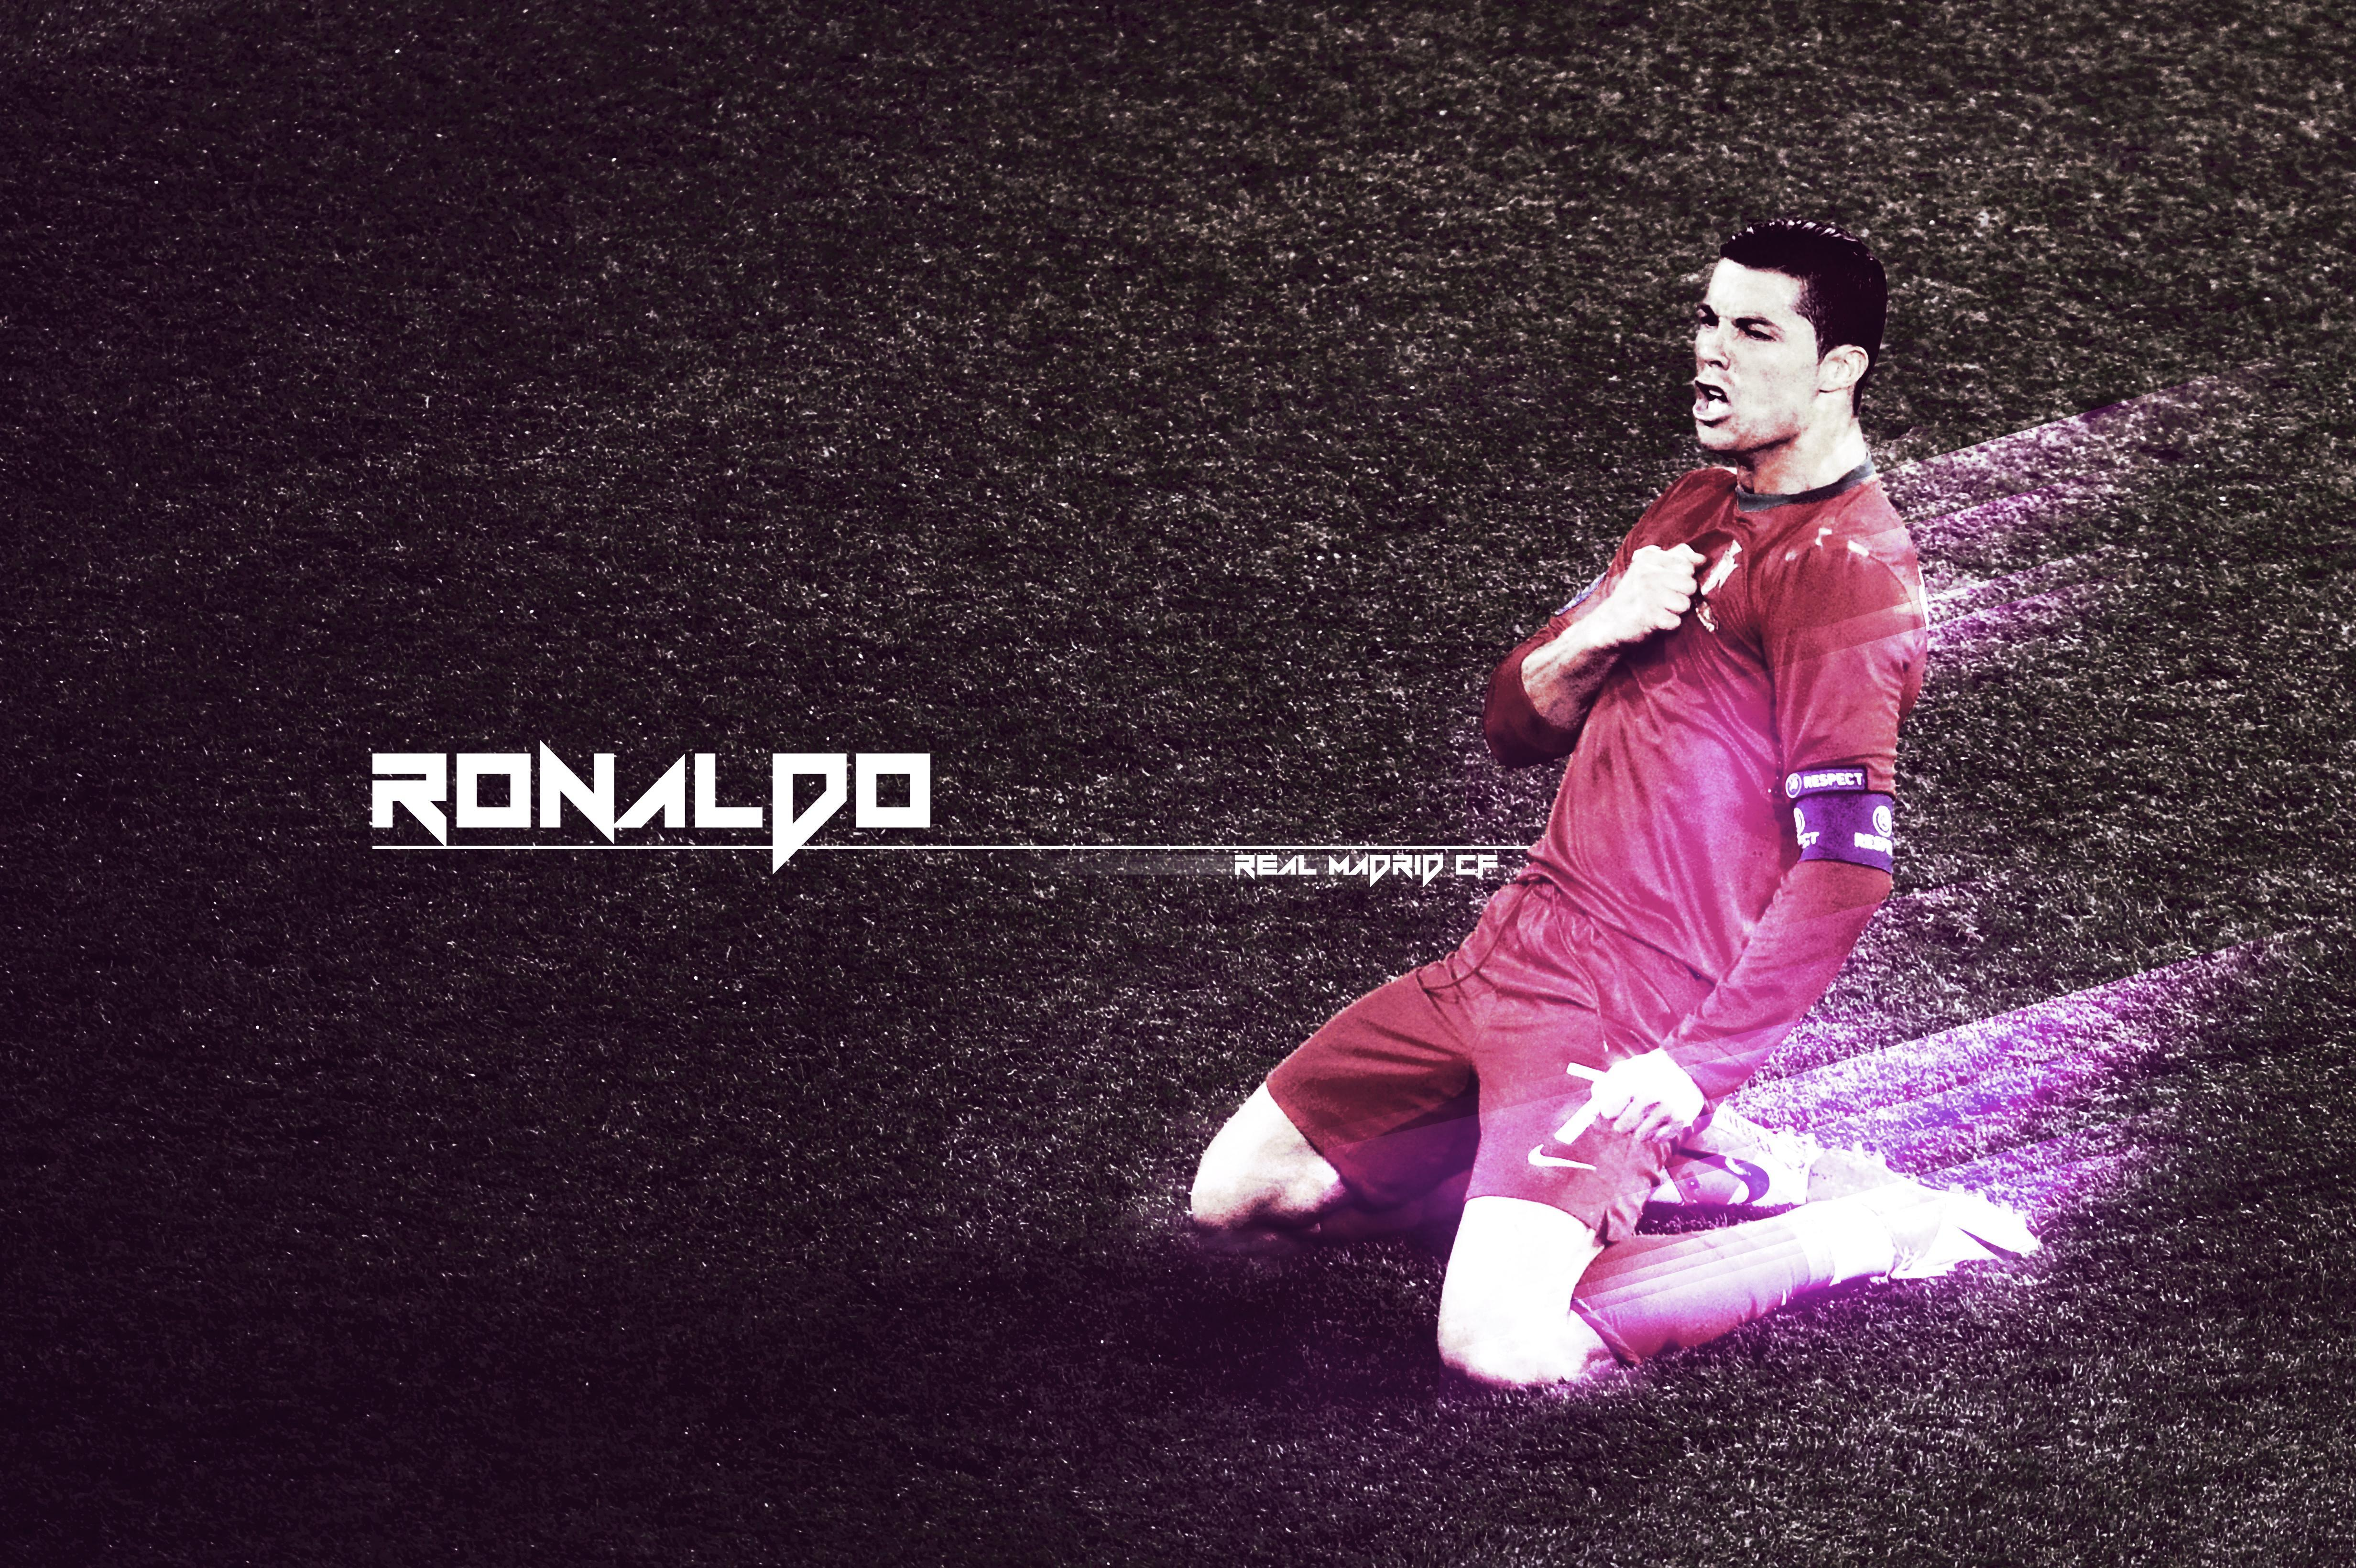 Ronaldo Football Wallpapers HD 4928x3280